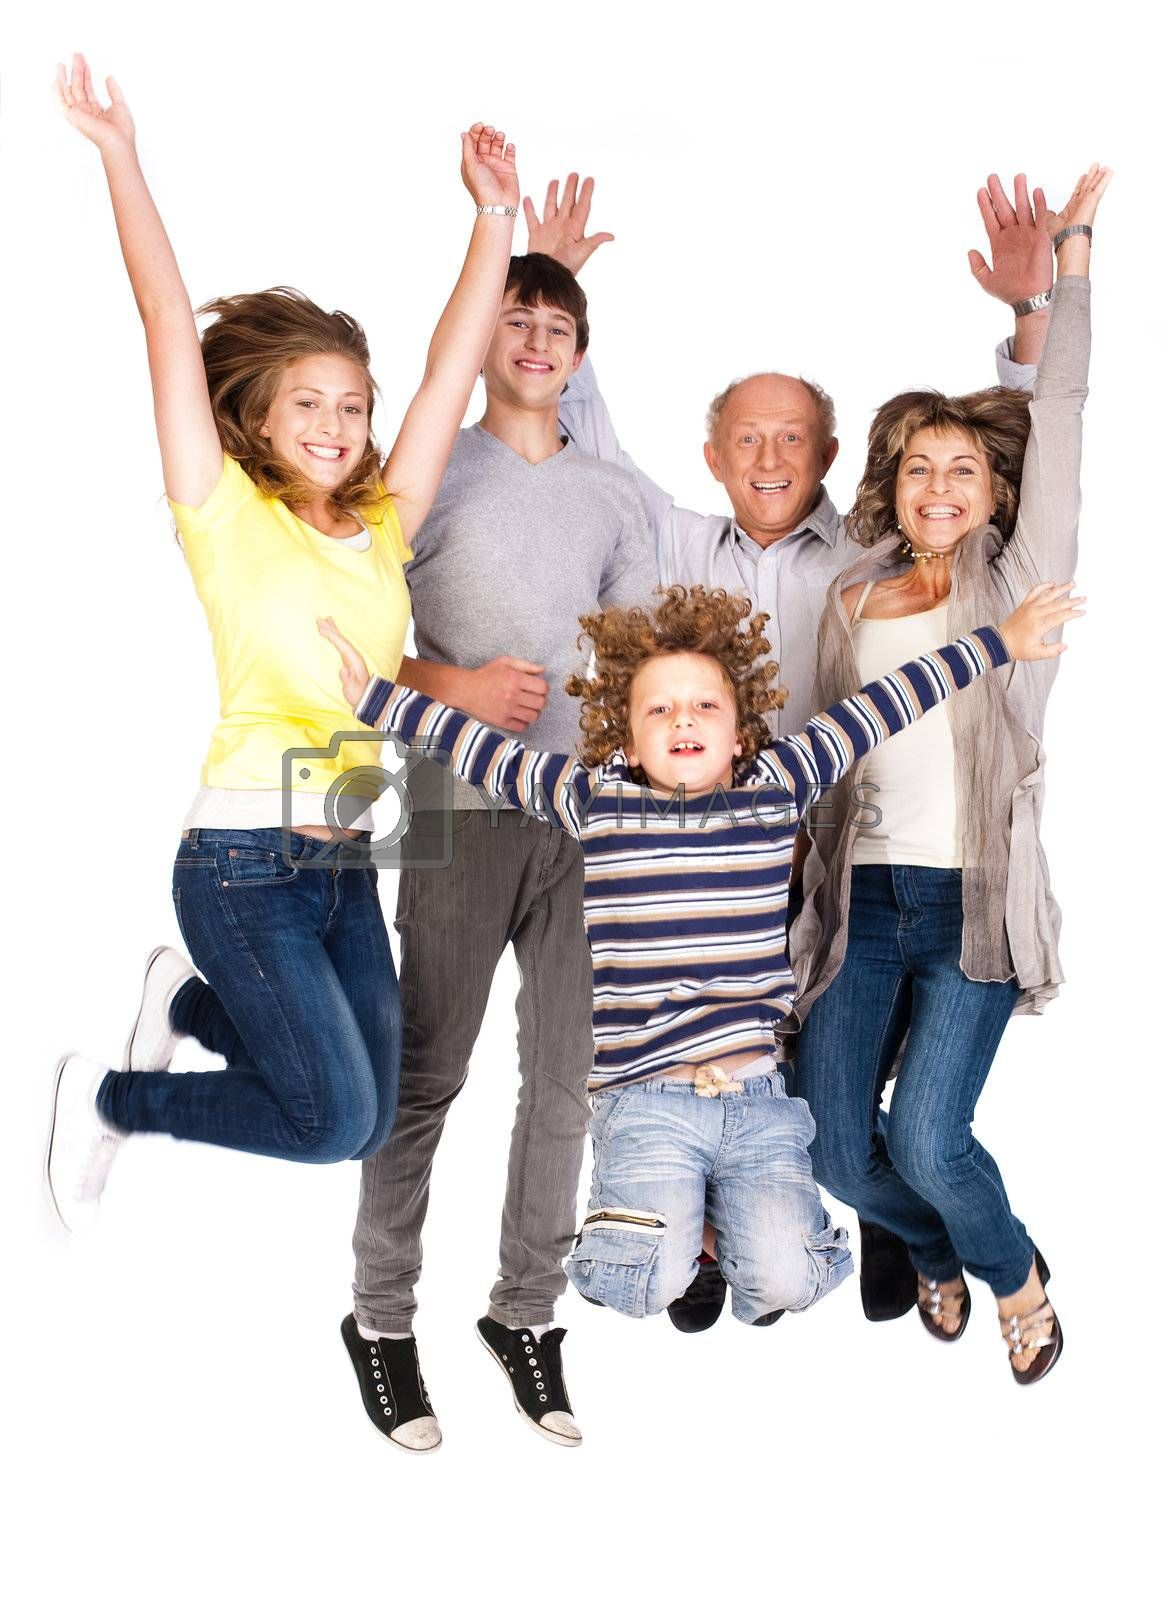 Jumping family having fun, enjoying indoors.